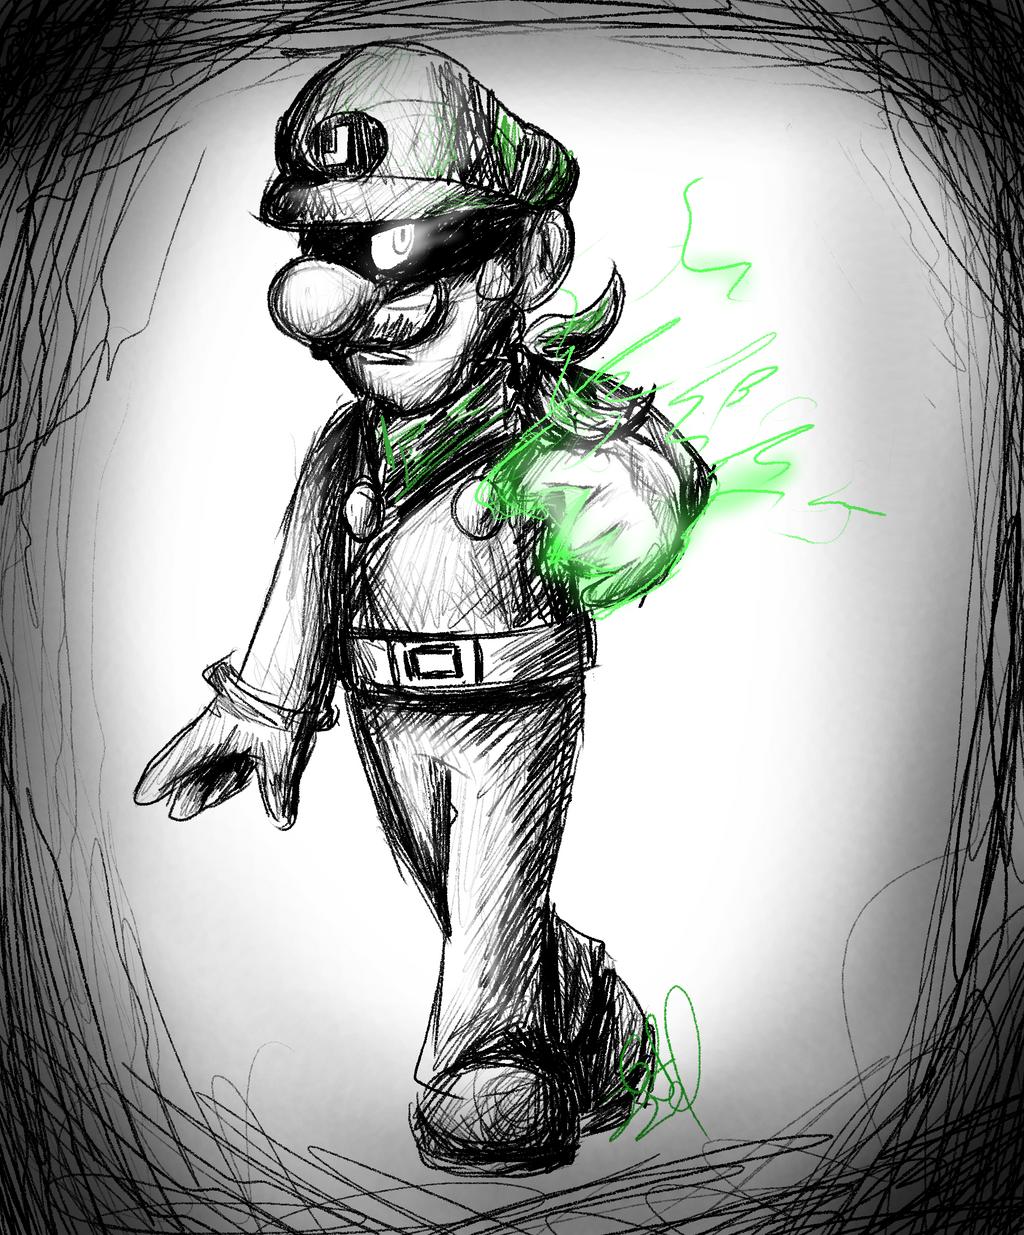 Mr. L by Gameaddict1234